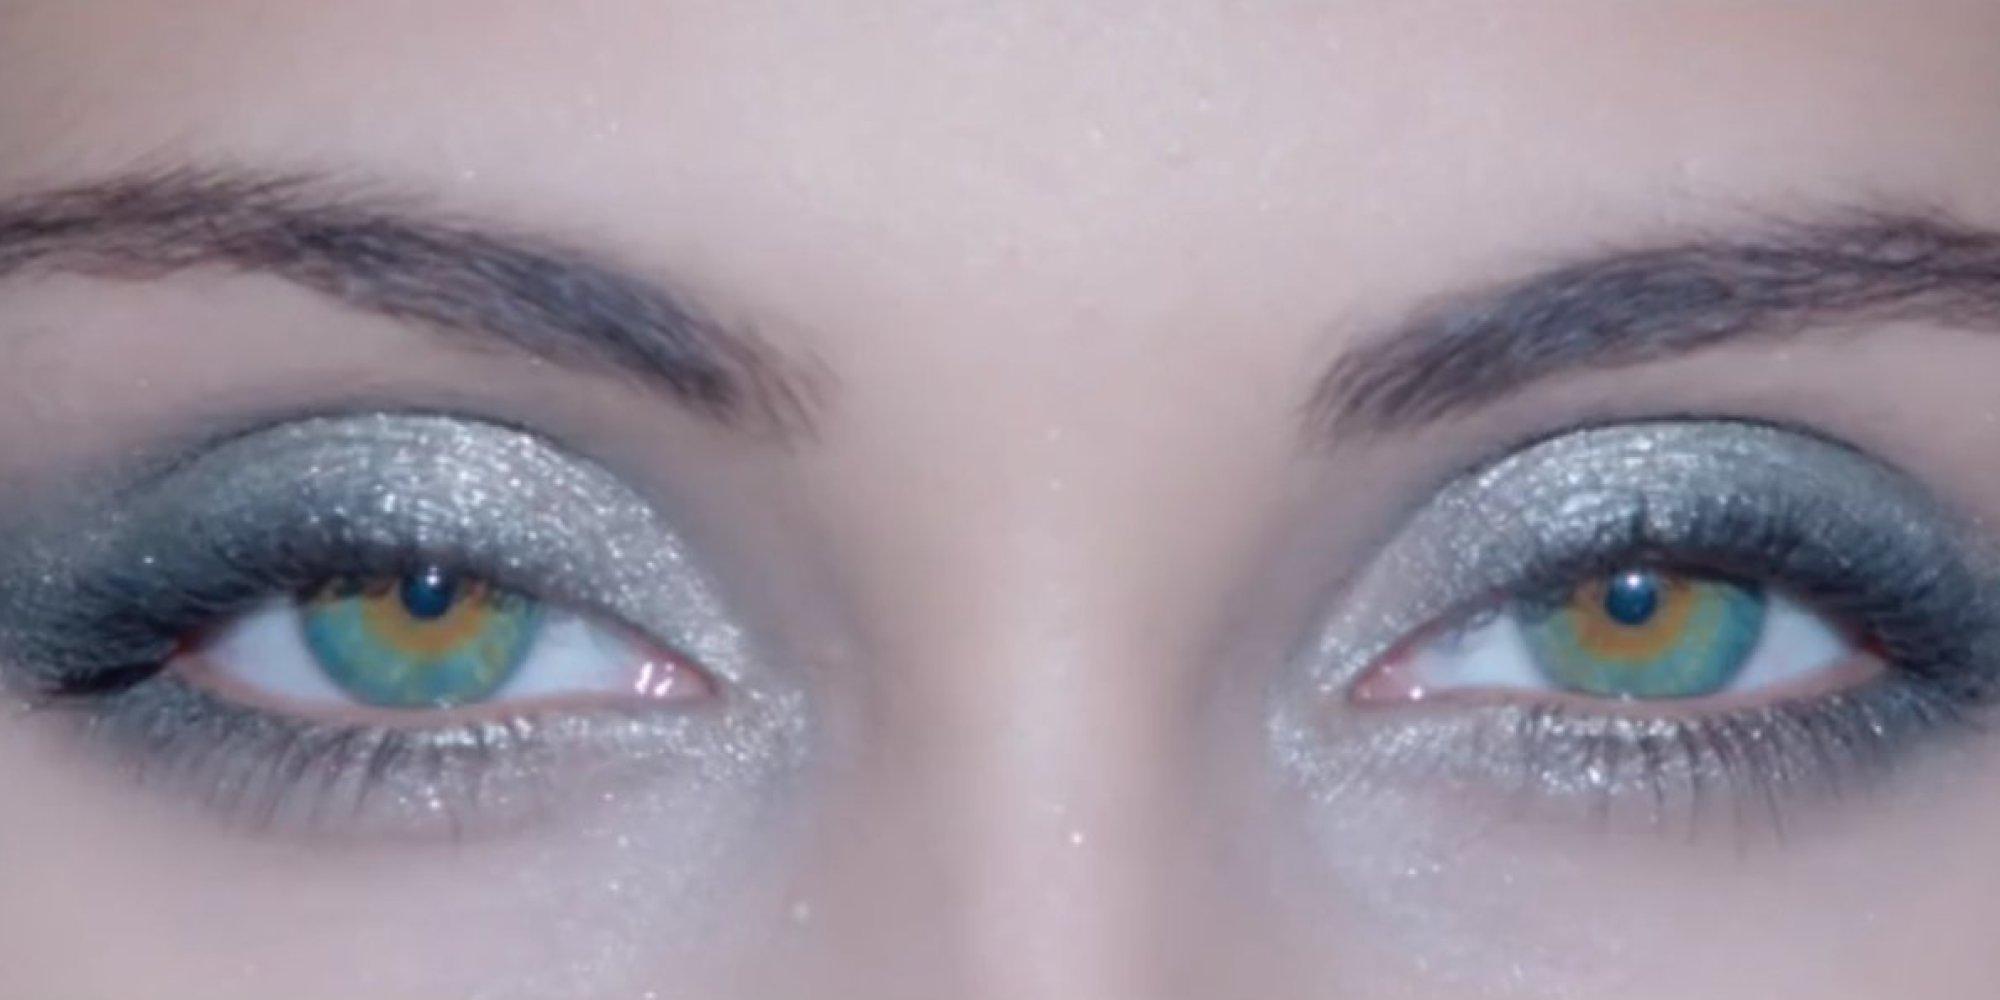 Giorgio Armani Beauty Eye Tint Gives Eyes Glamorous Studio 54 Vibes | HuffPost